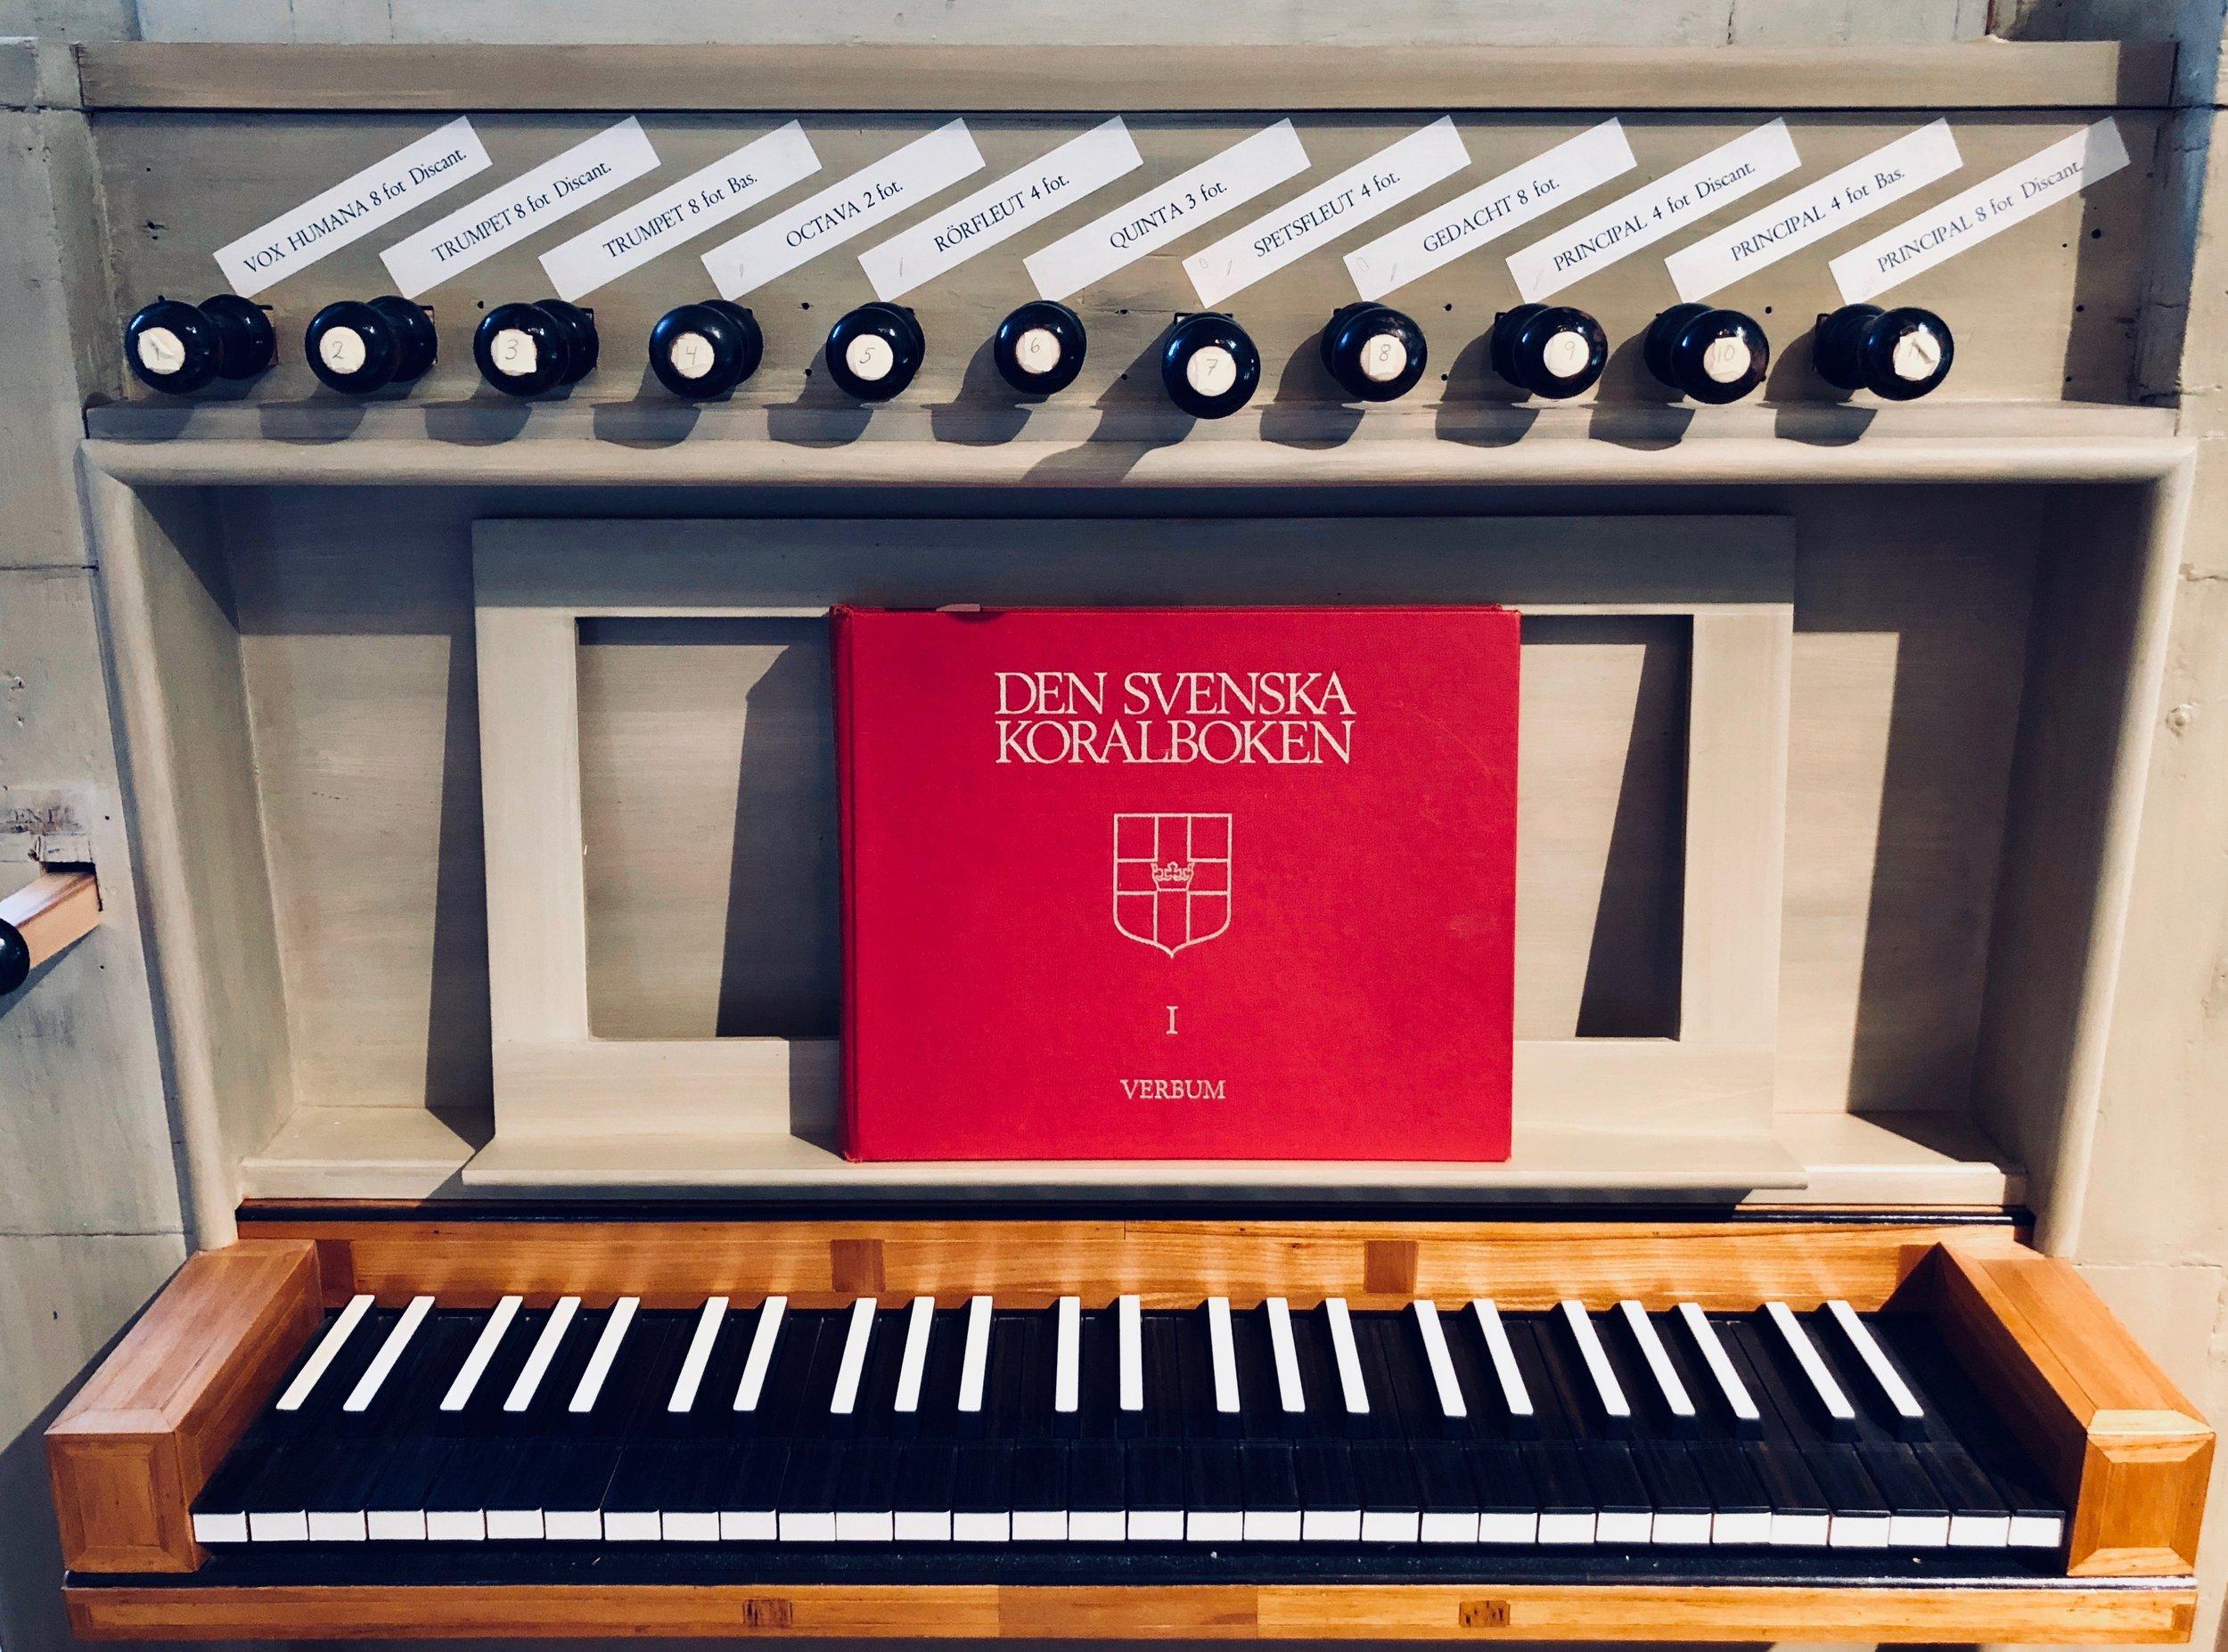 Keydesk, 1783 Schiörlin organ in Jonsered, Sweden.